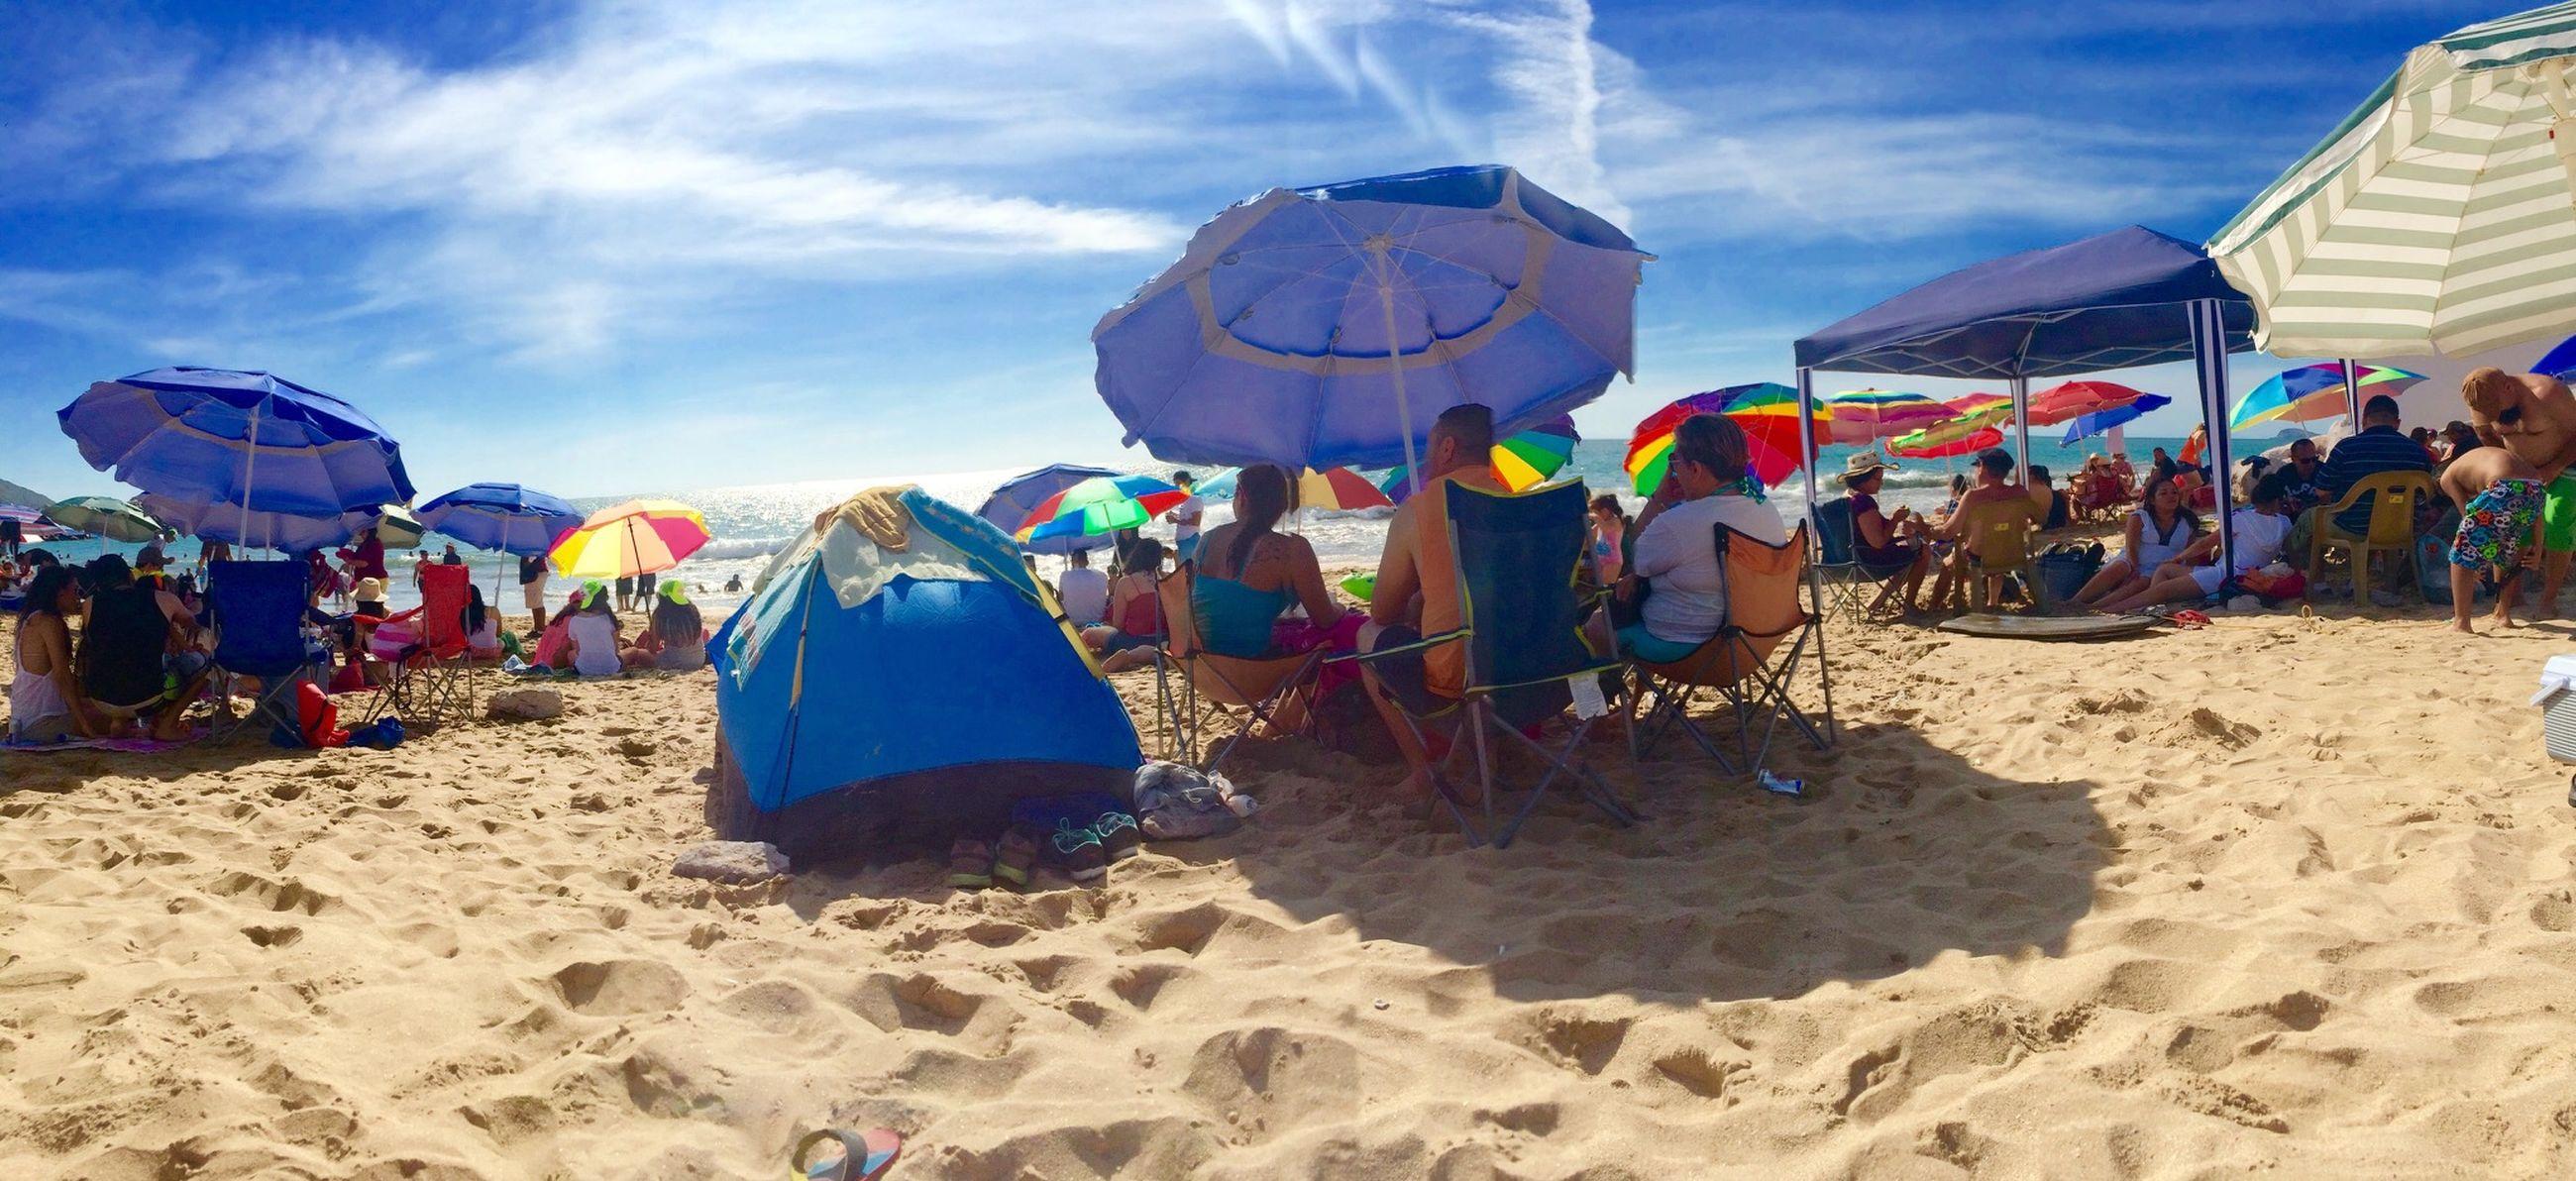 beach, sand, large group of people, sky, person, leisure activity, lifestyles, vacations, men, beach umbrella, shore, tourist, mixed age range, parasol, tourism, enjoyment, day, sea, cloud - sky